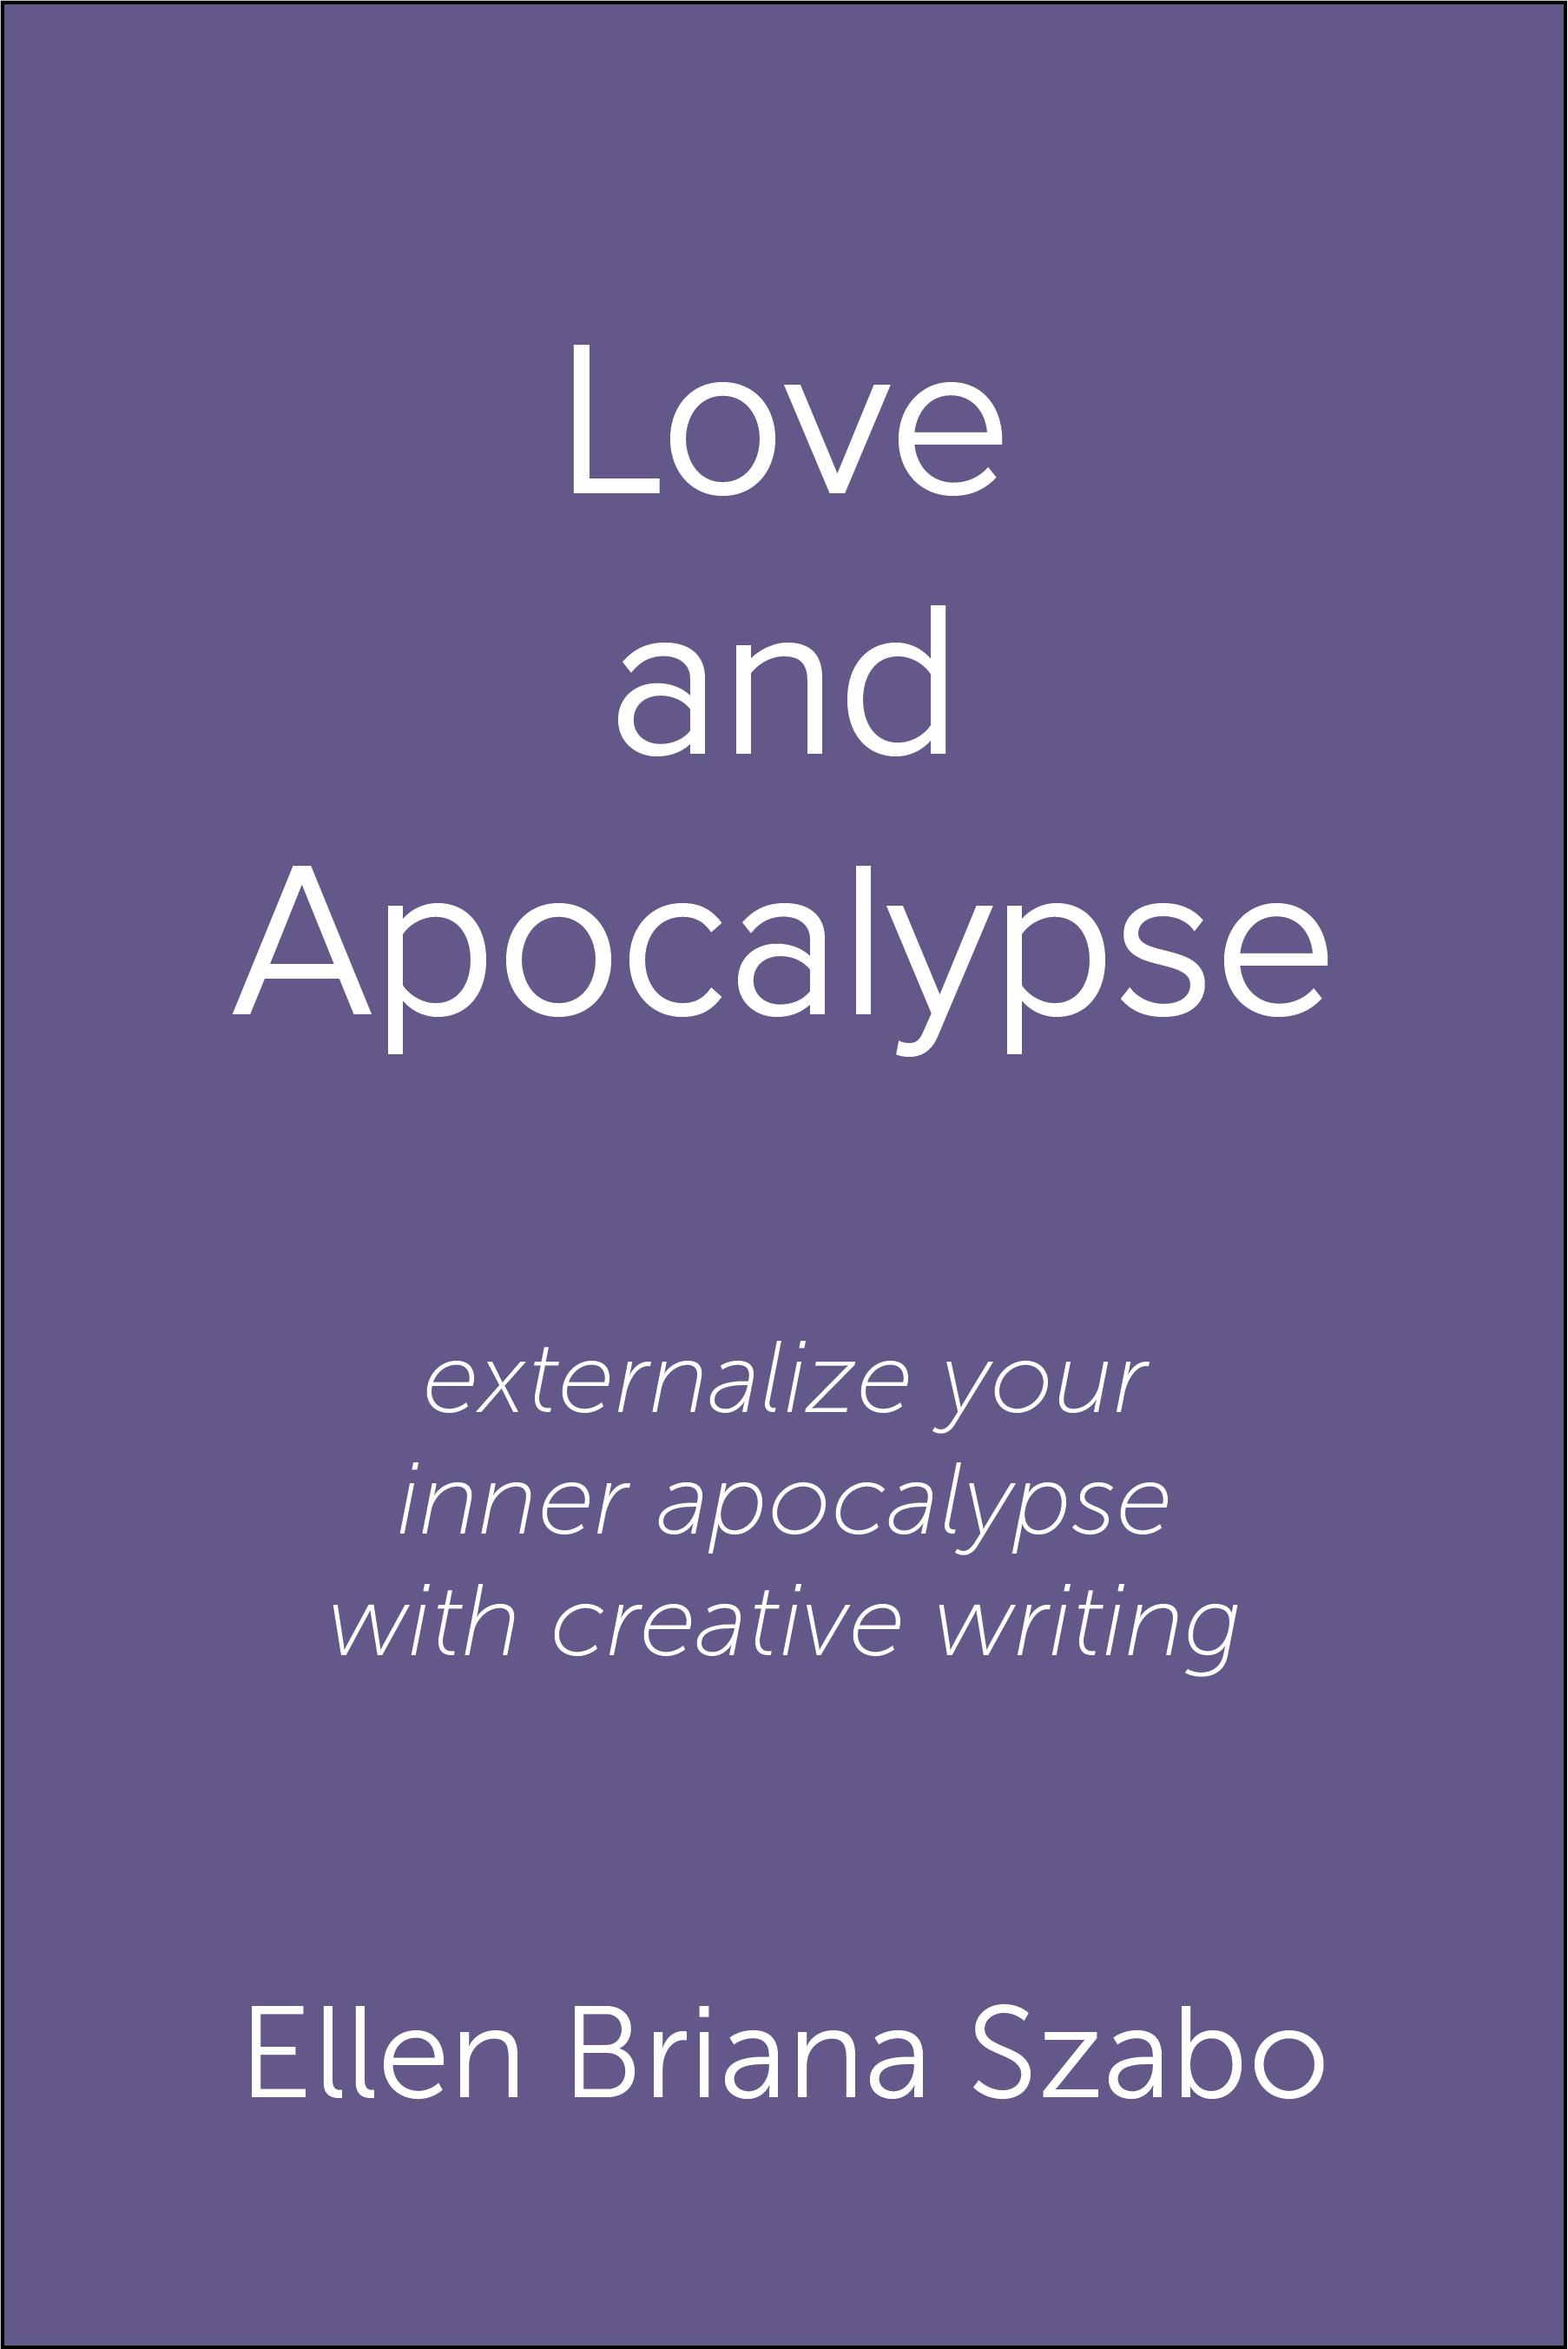 love and apocalypse ebook.jpg